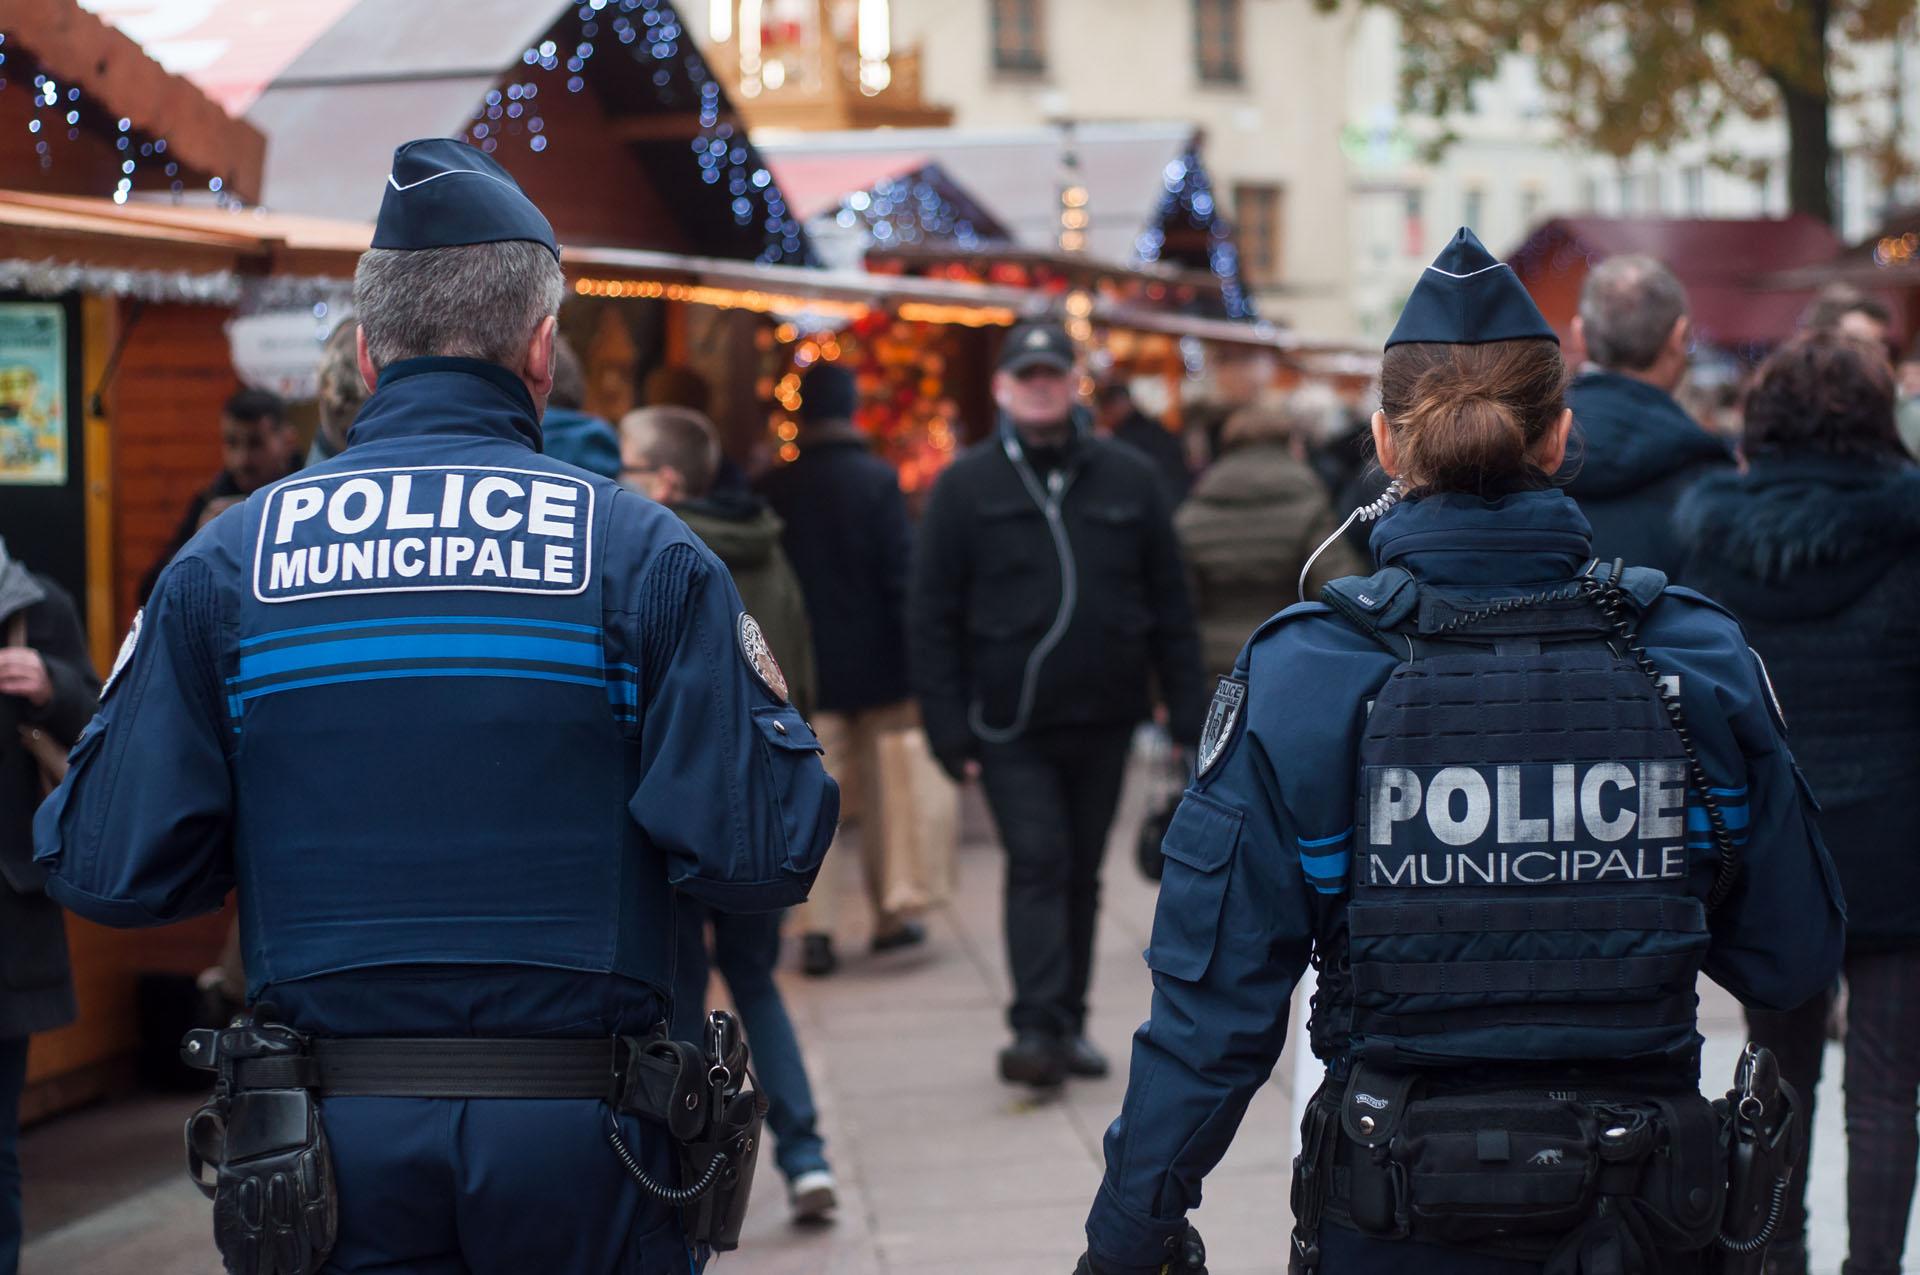 metier-devenir-policier-municipal